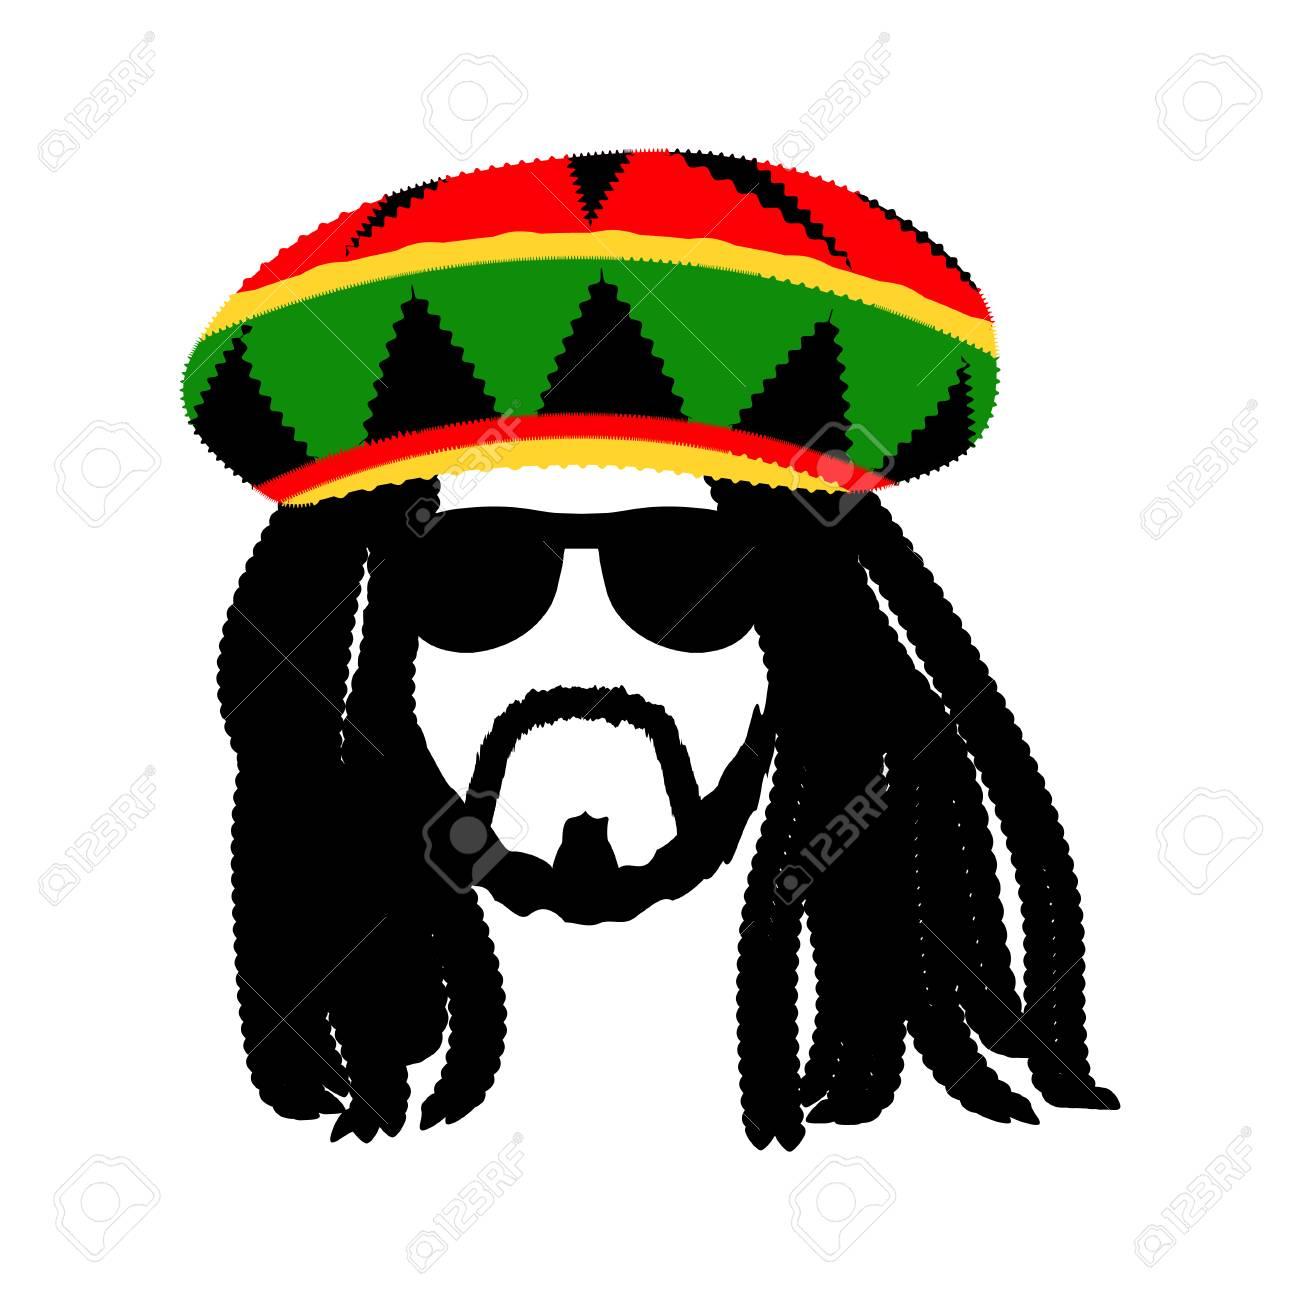 Jamaican rasta hat with dreadlocks and beard. Reggae style avatar. Isolated  on white background 74cc292a9